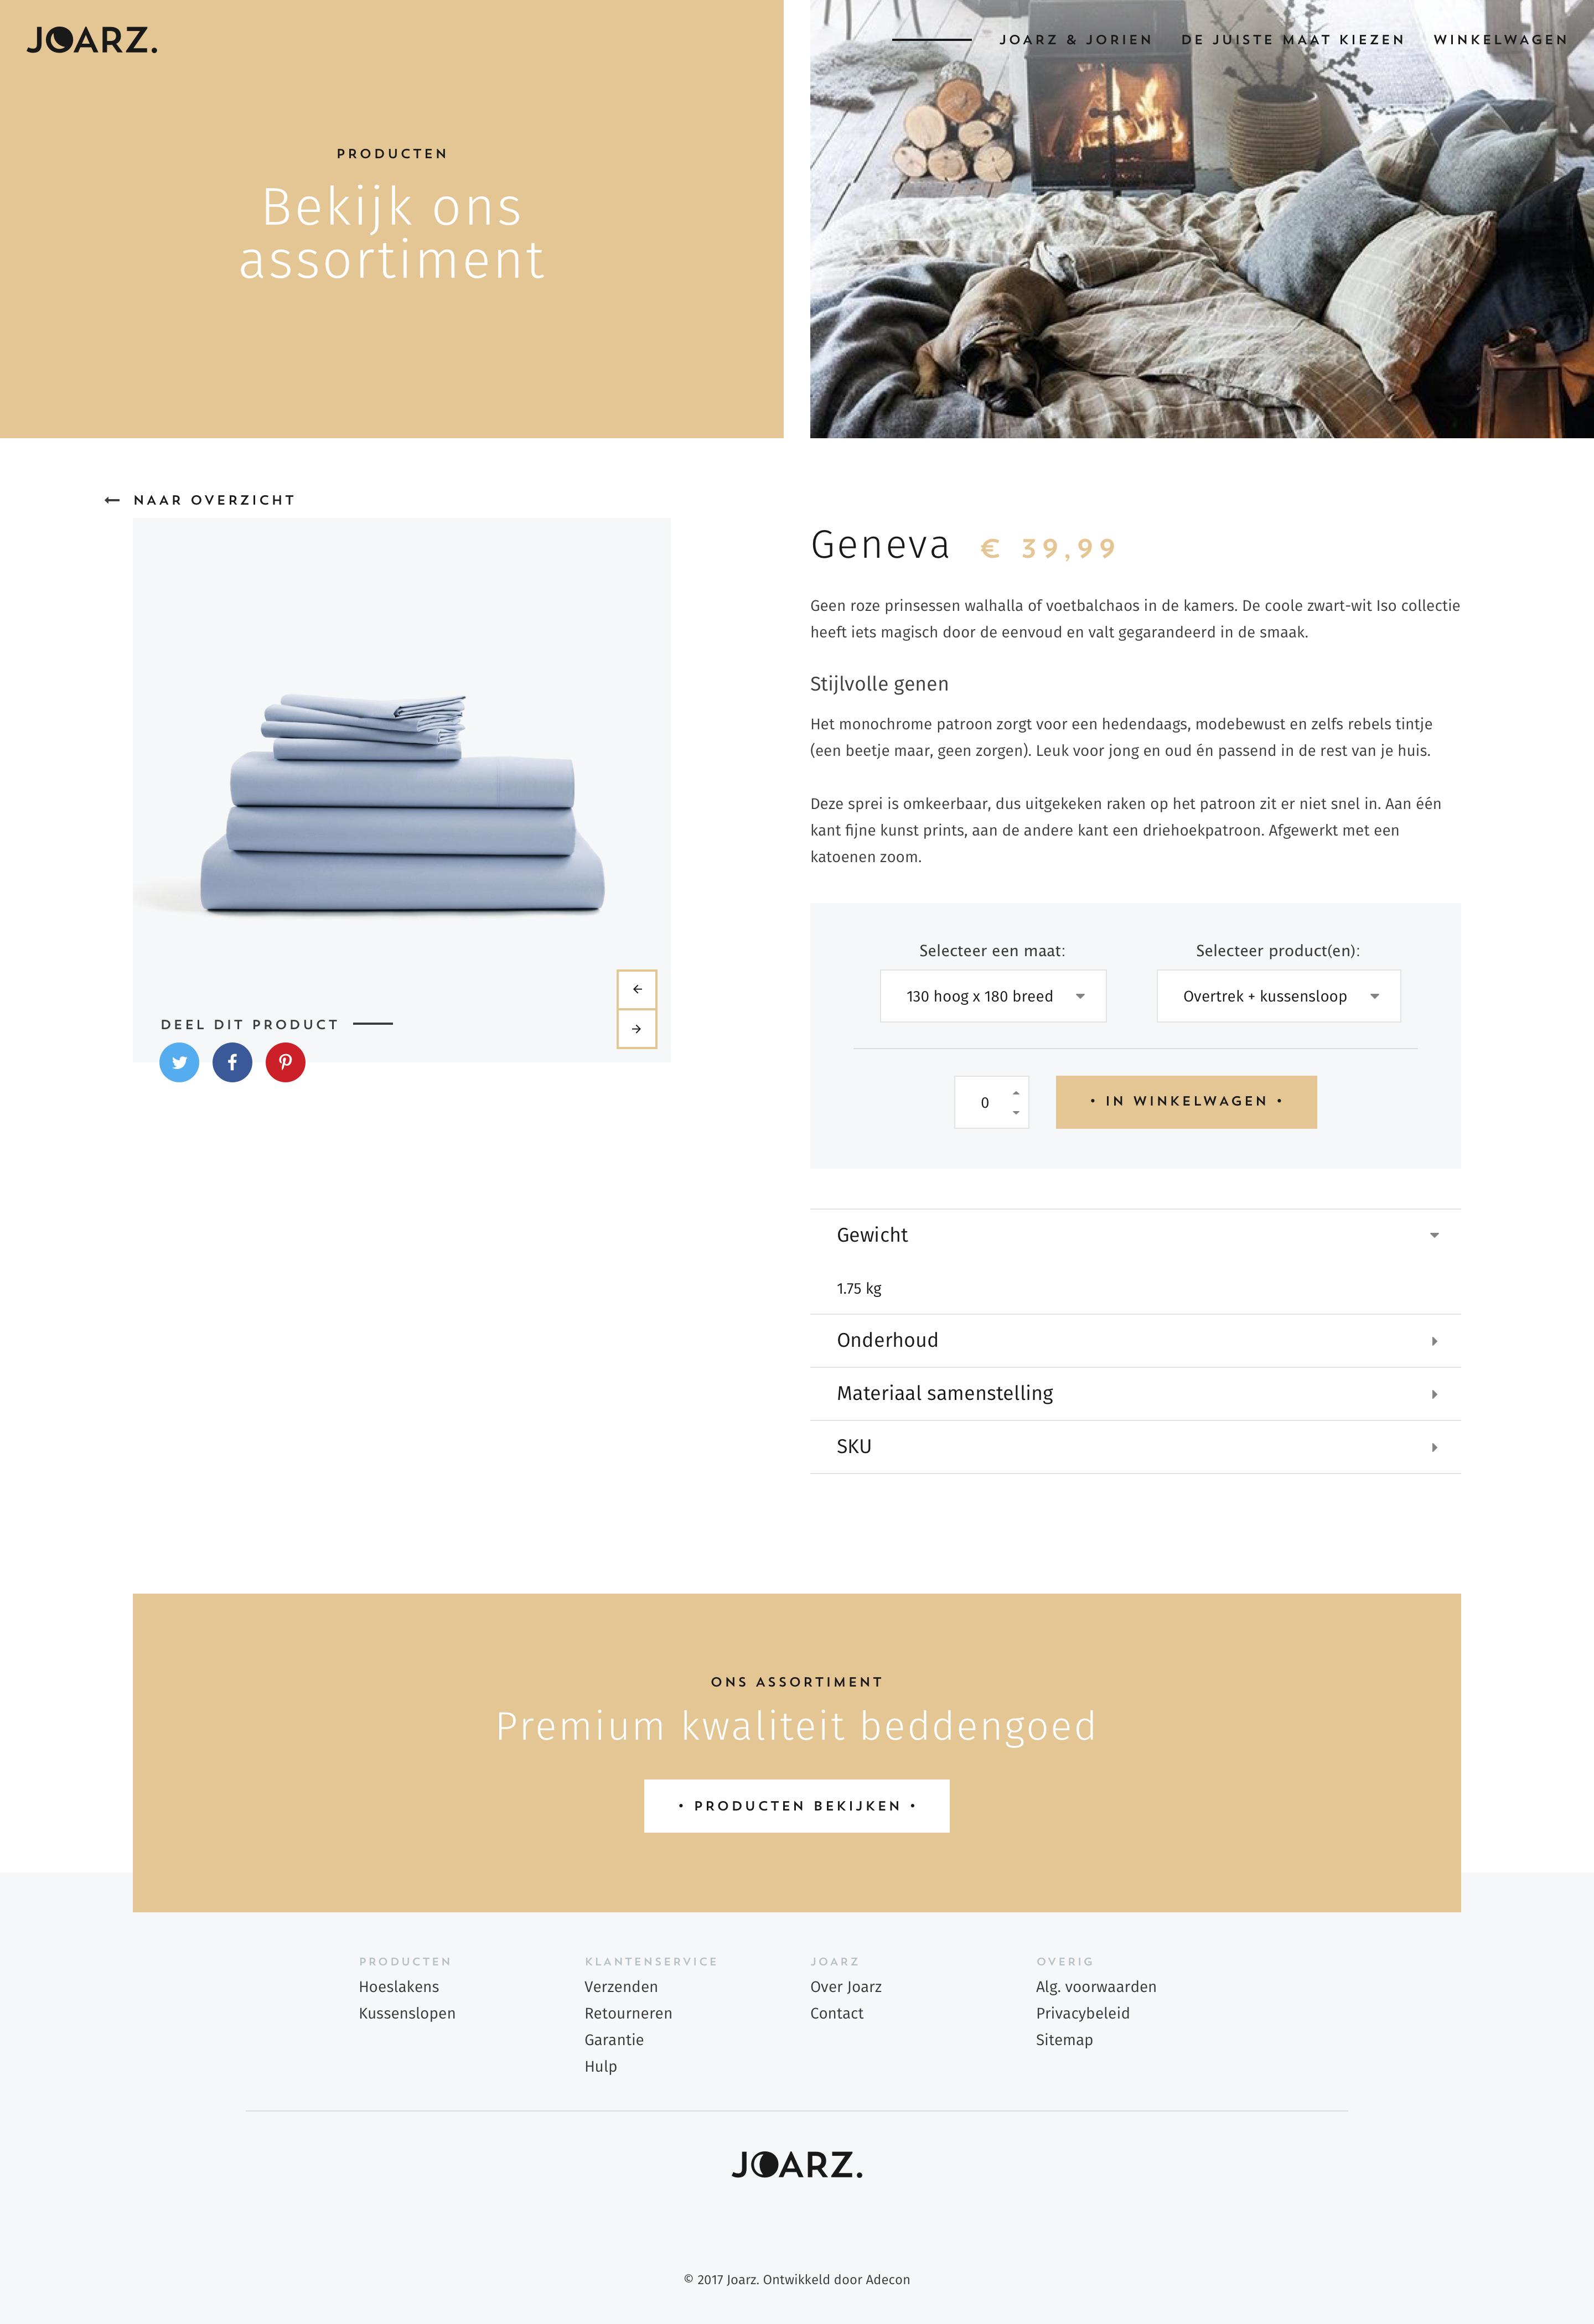 Joarz productdetail layout 2x.png